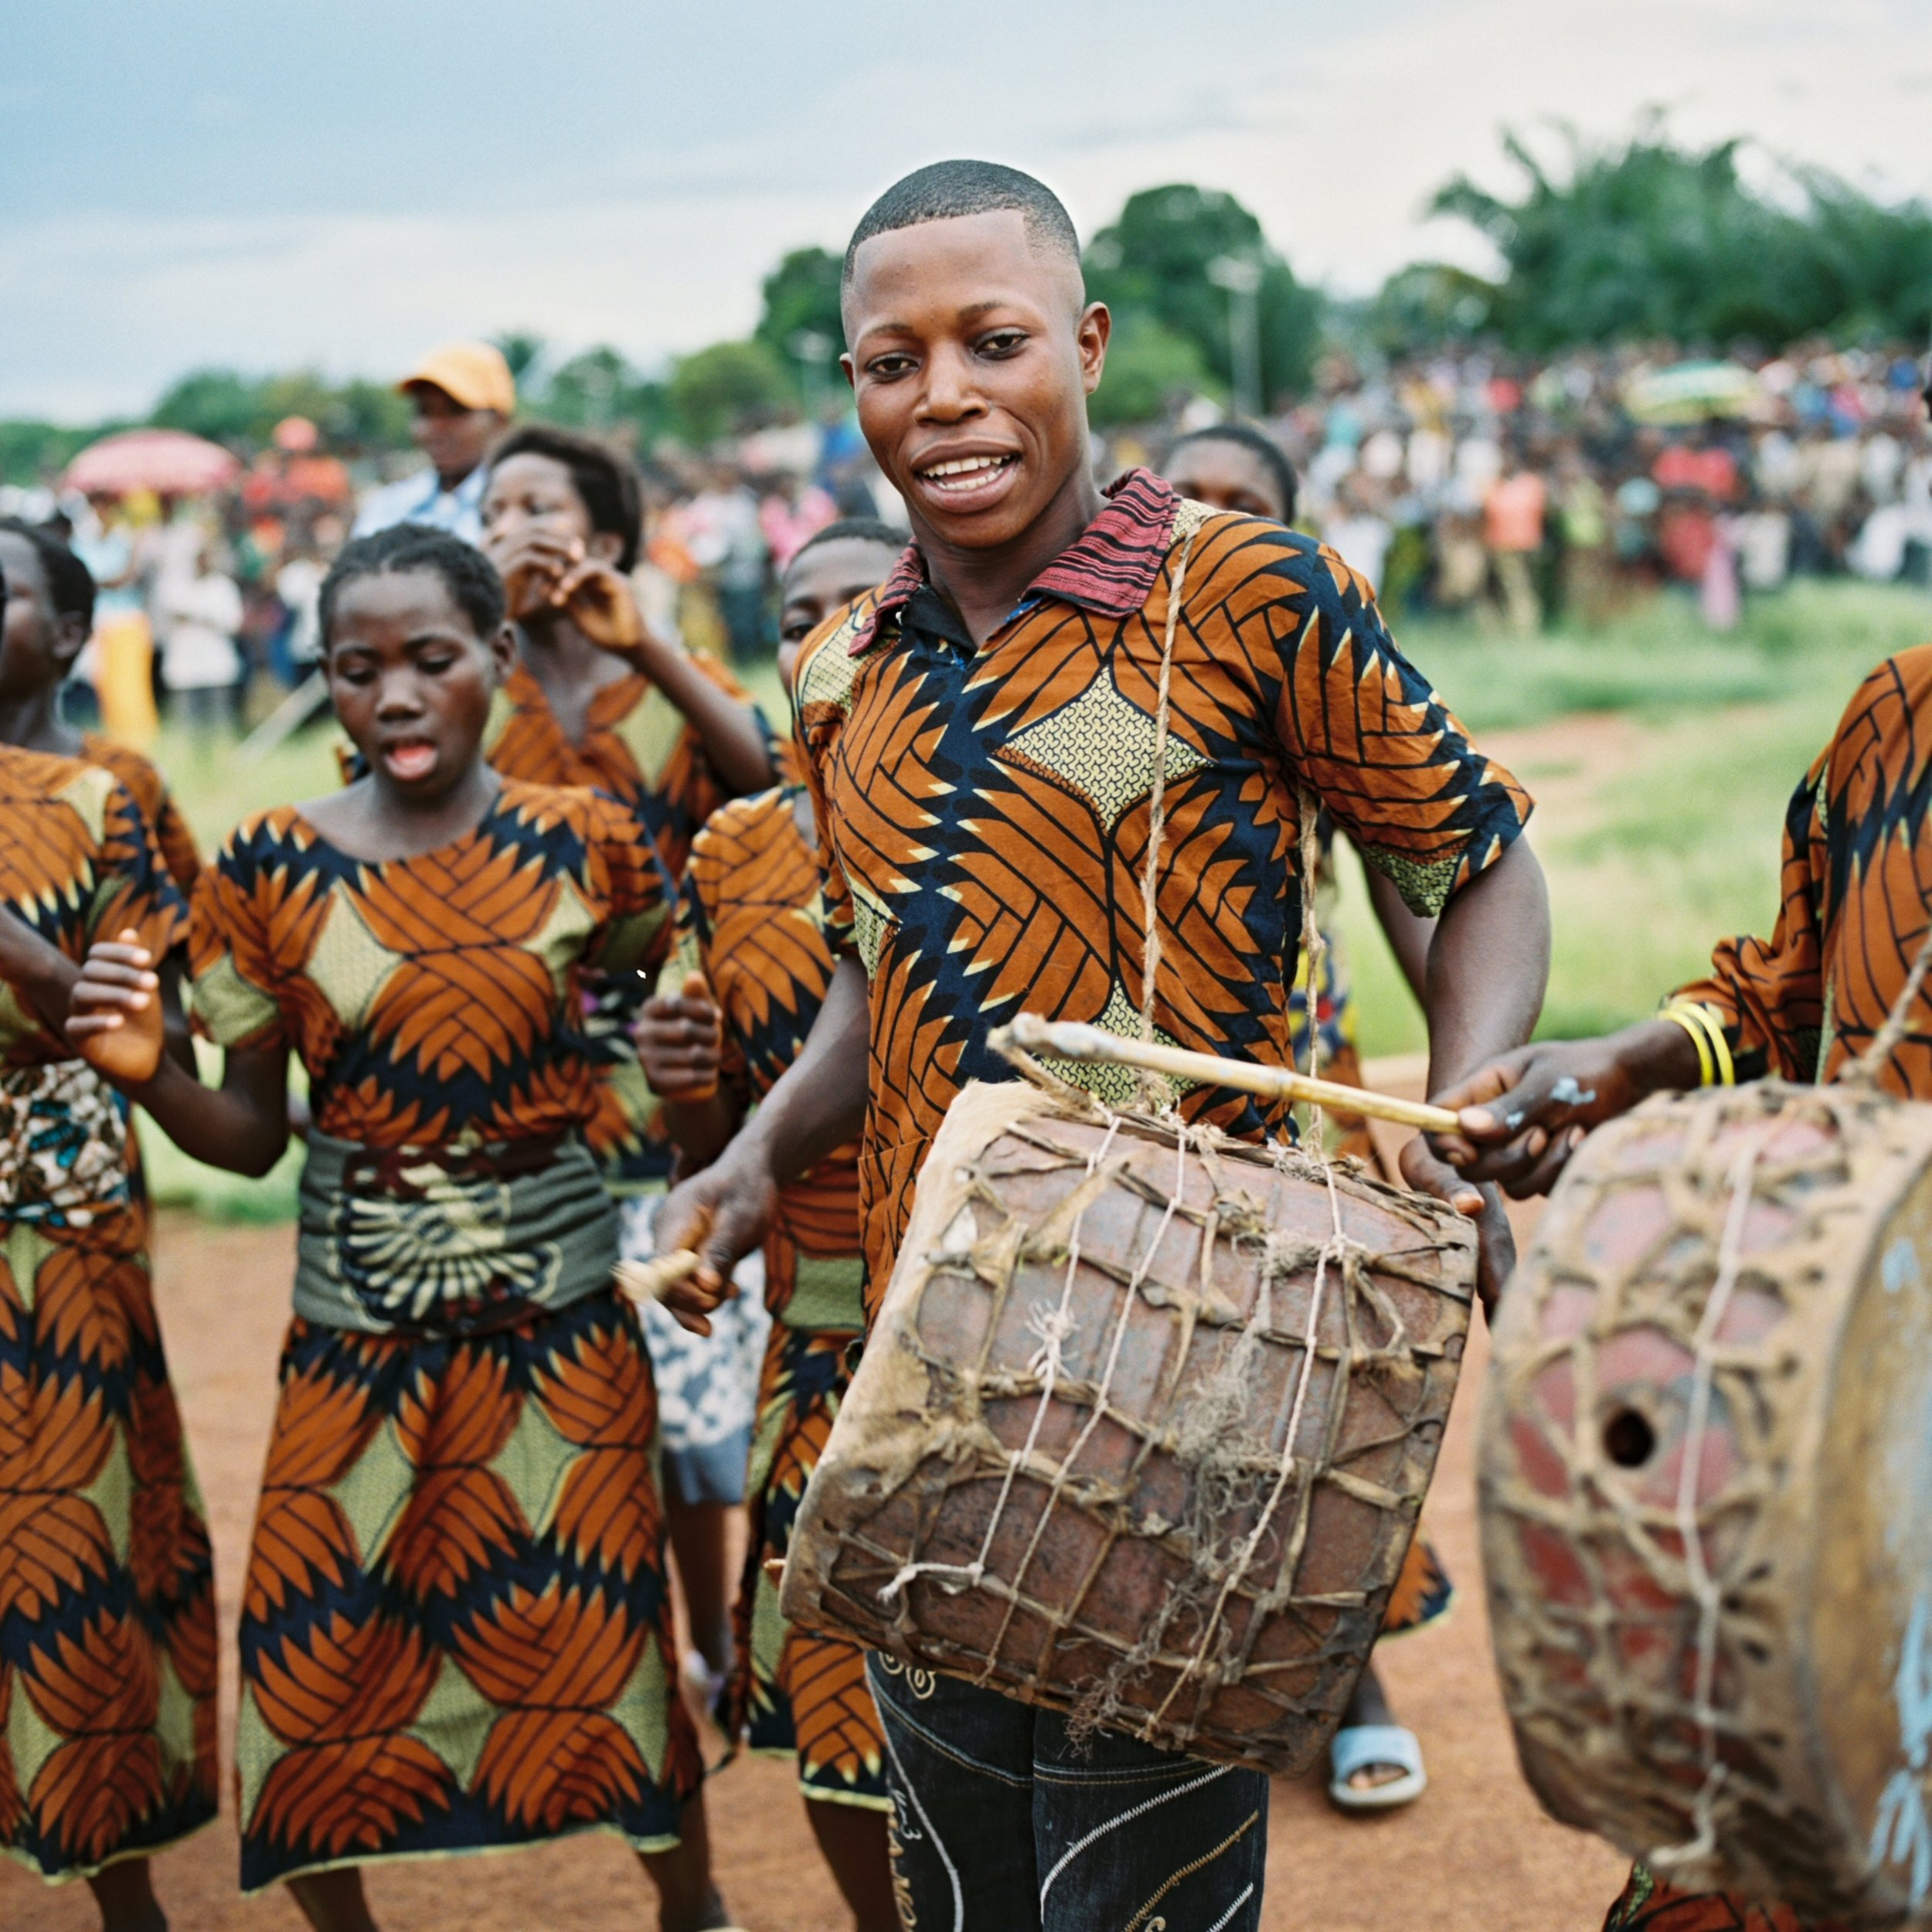 20100324_CScott_Visit_DRC_CONGO-6.jpg